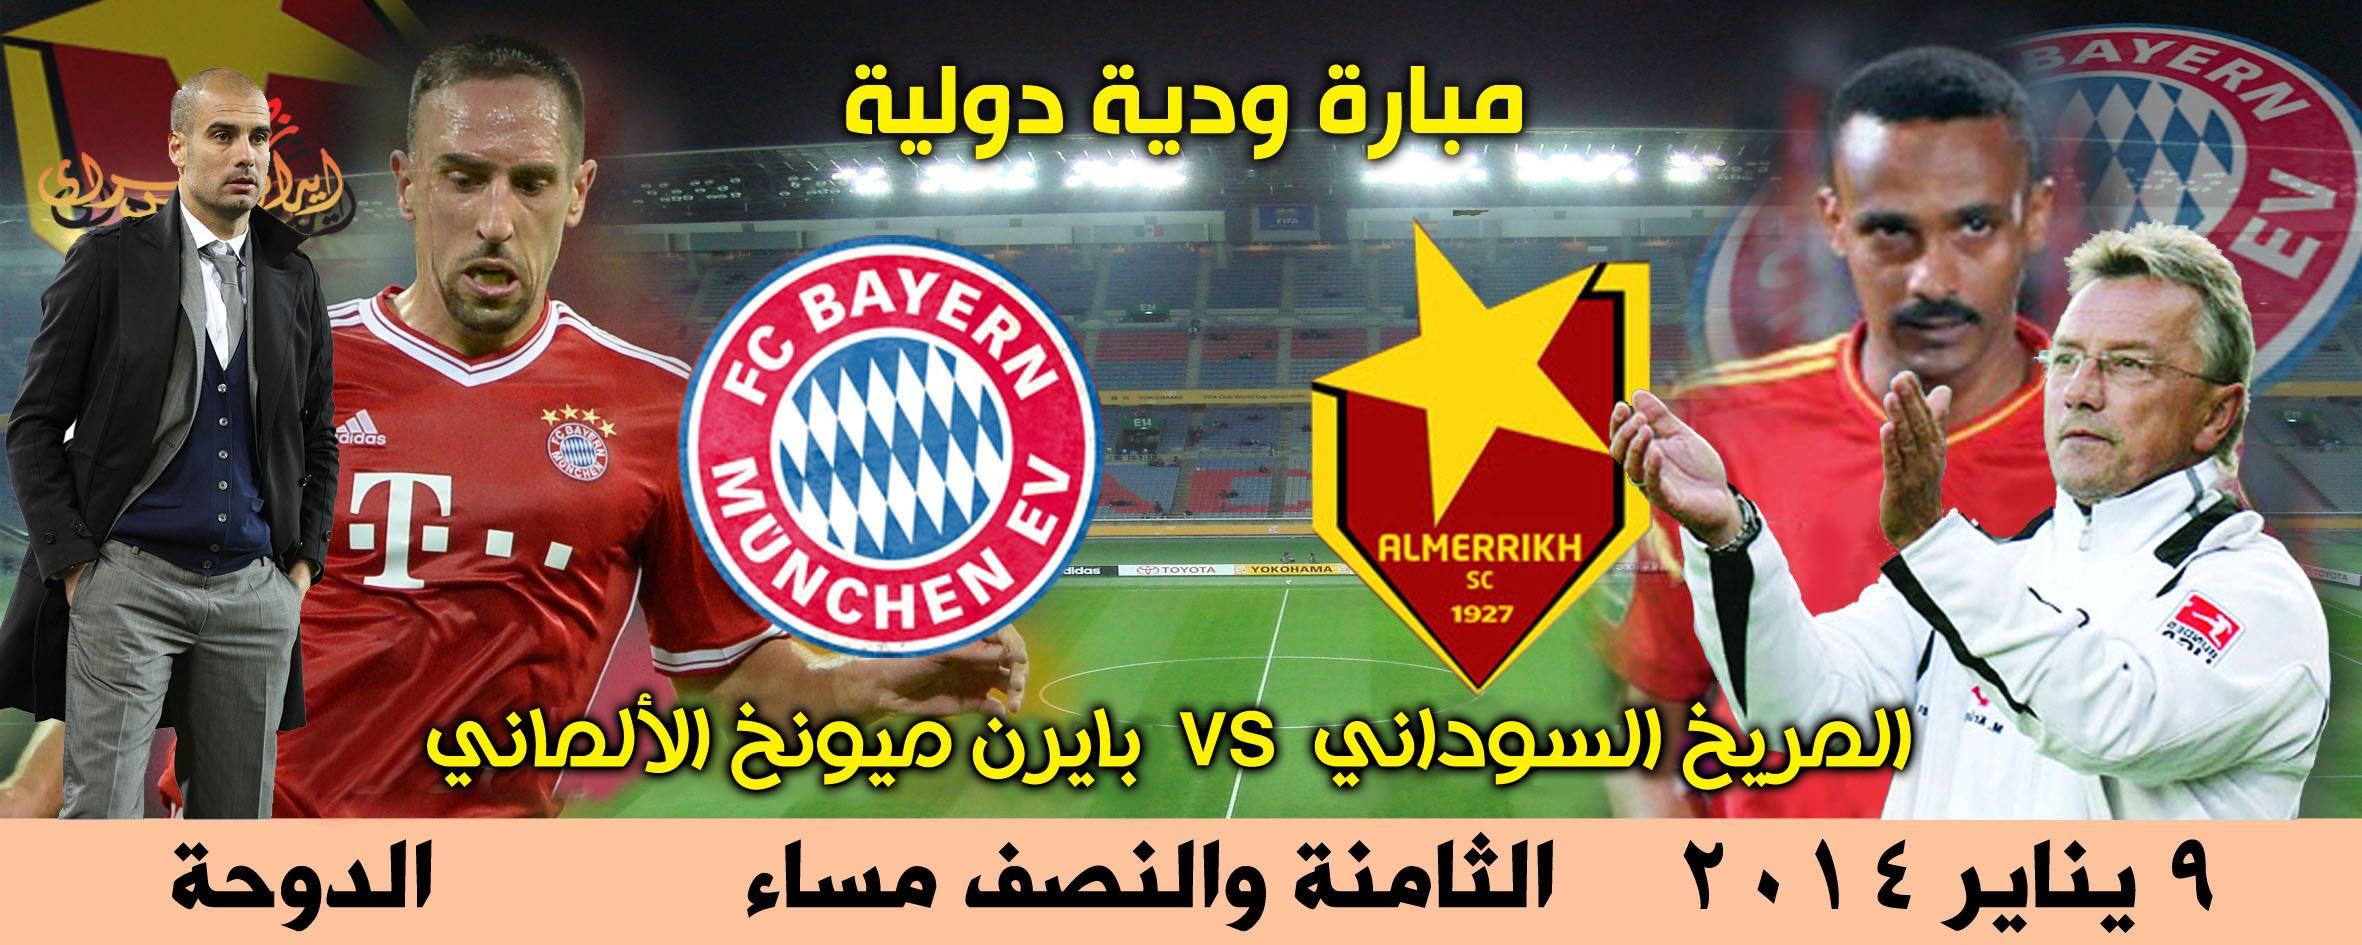 ���� - ����� ������ ����� ������ ������� �������� ����� ������ 9-1-2014 Bayern Munich vs Al Merrikh